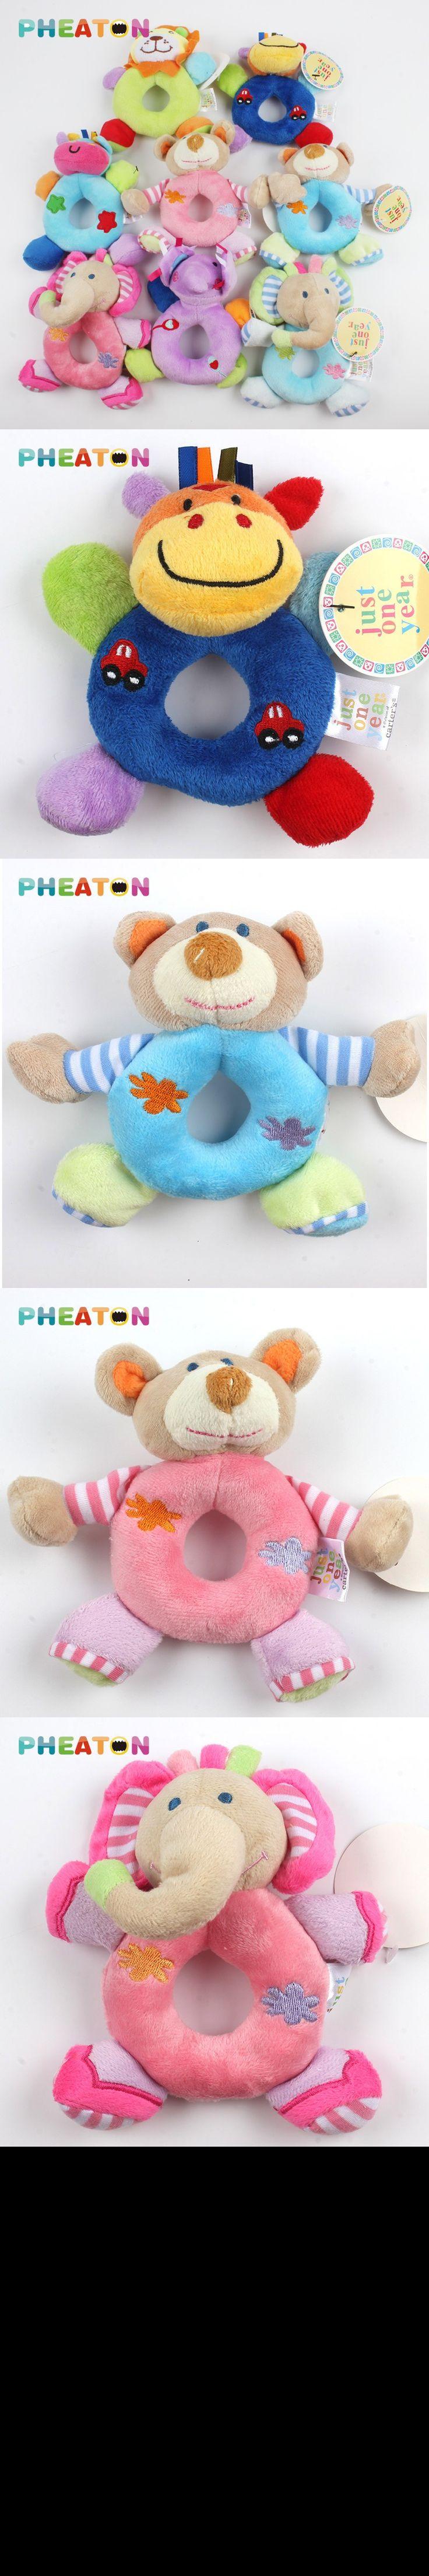 Best 25 Educational baby toys ideas on Pinterest